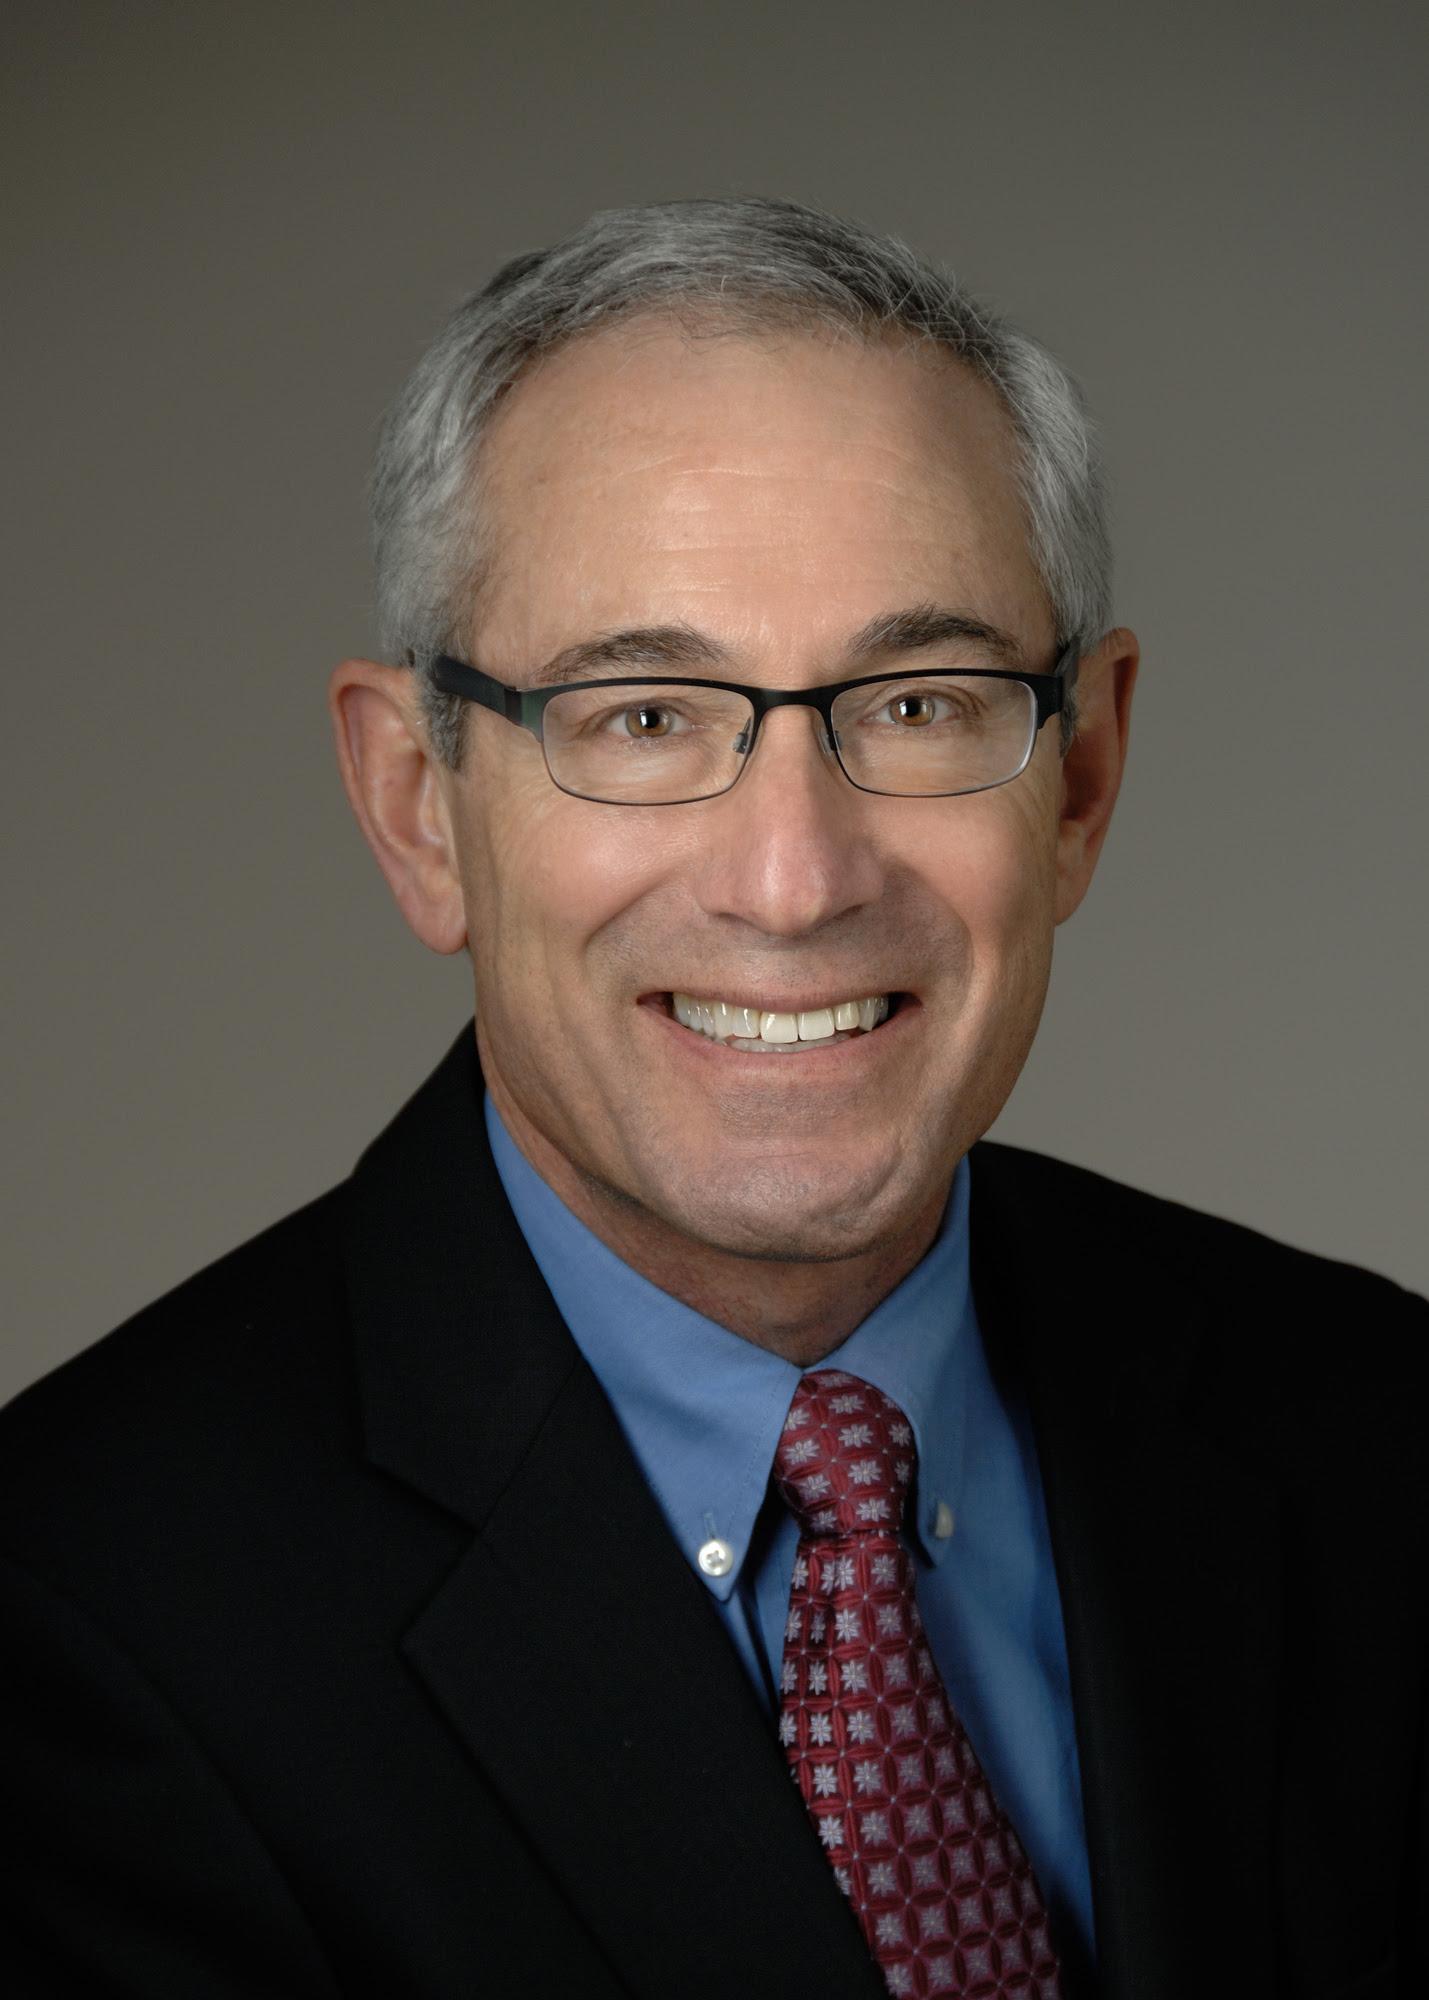 Dr. Tom Insel